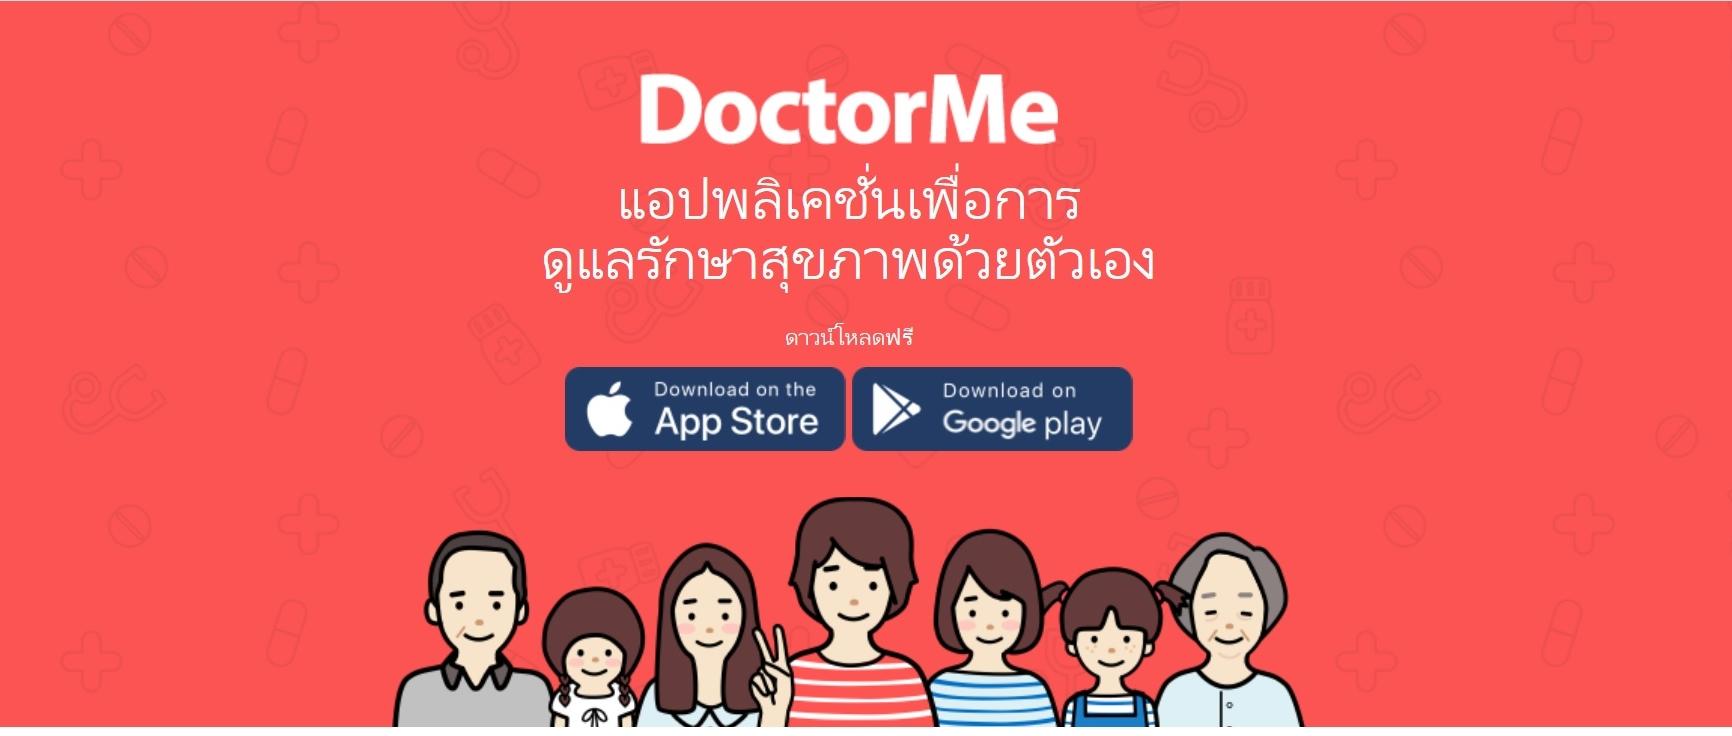 'DoctorMe' แอพฯ ดูแลสุขภาพที่เหมือนมีหมอดีๆ อยู่ในมือคุณ